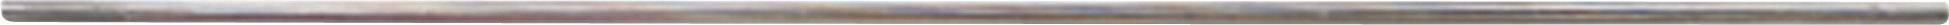 Wolframová elektroda Lorch, Ø 2,4 mm, 5 ks